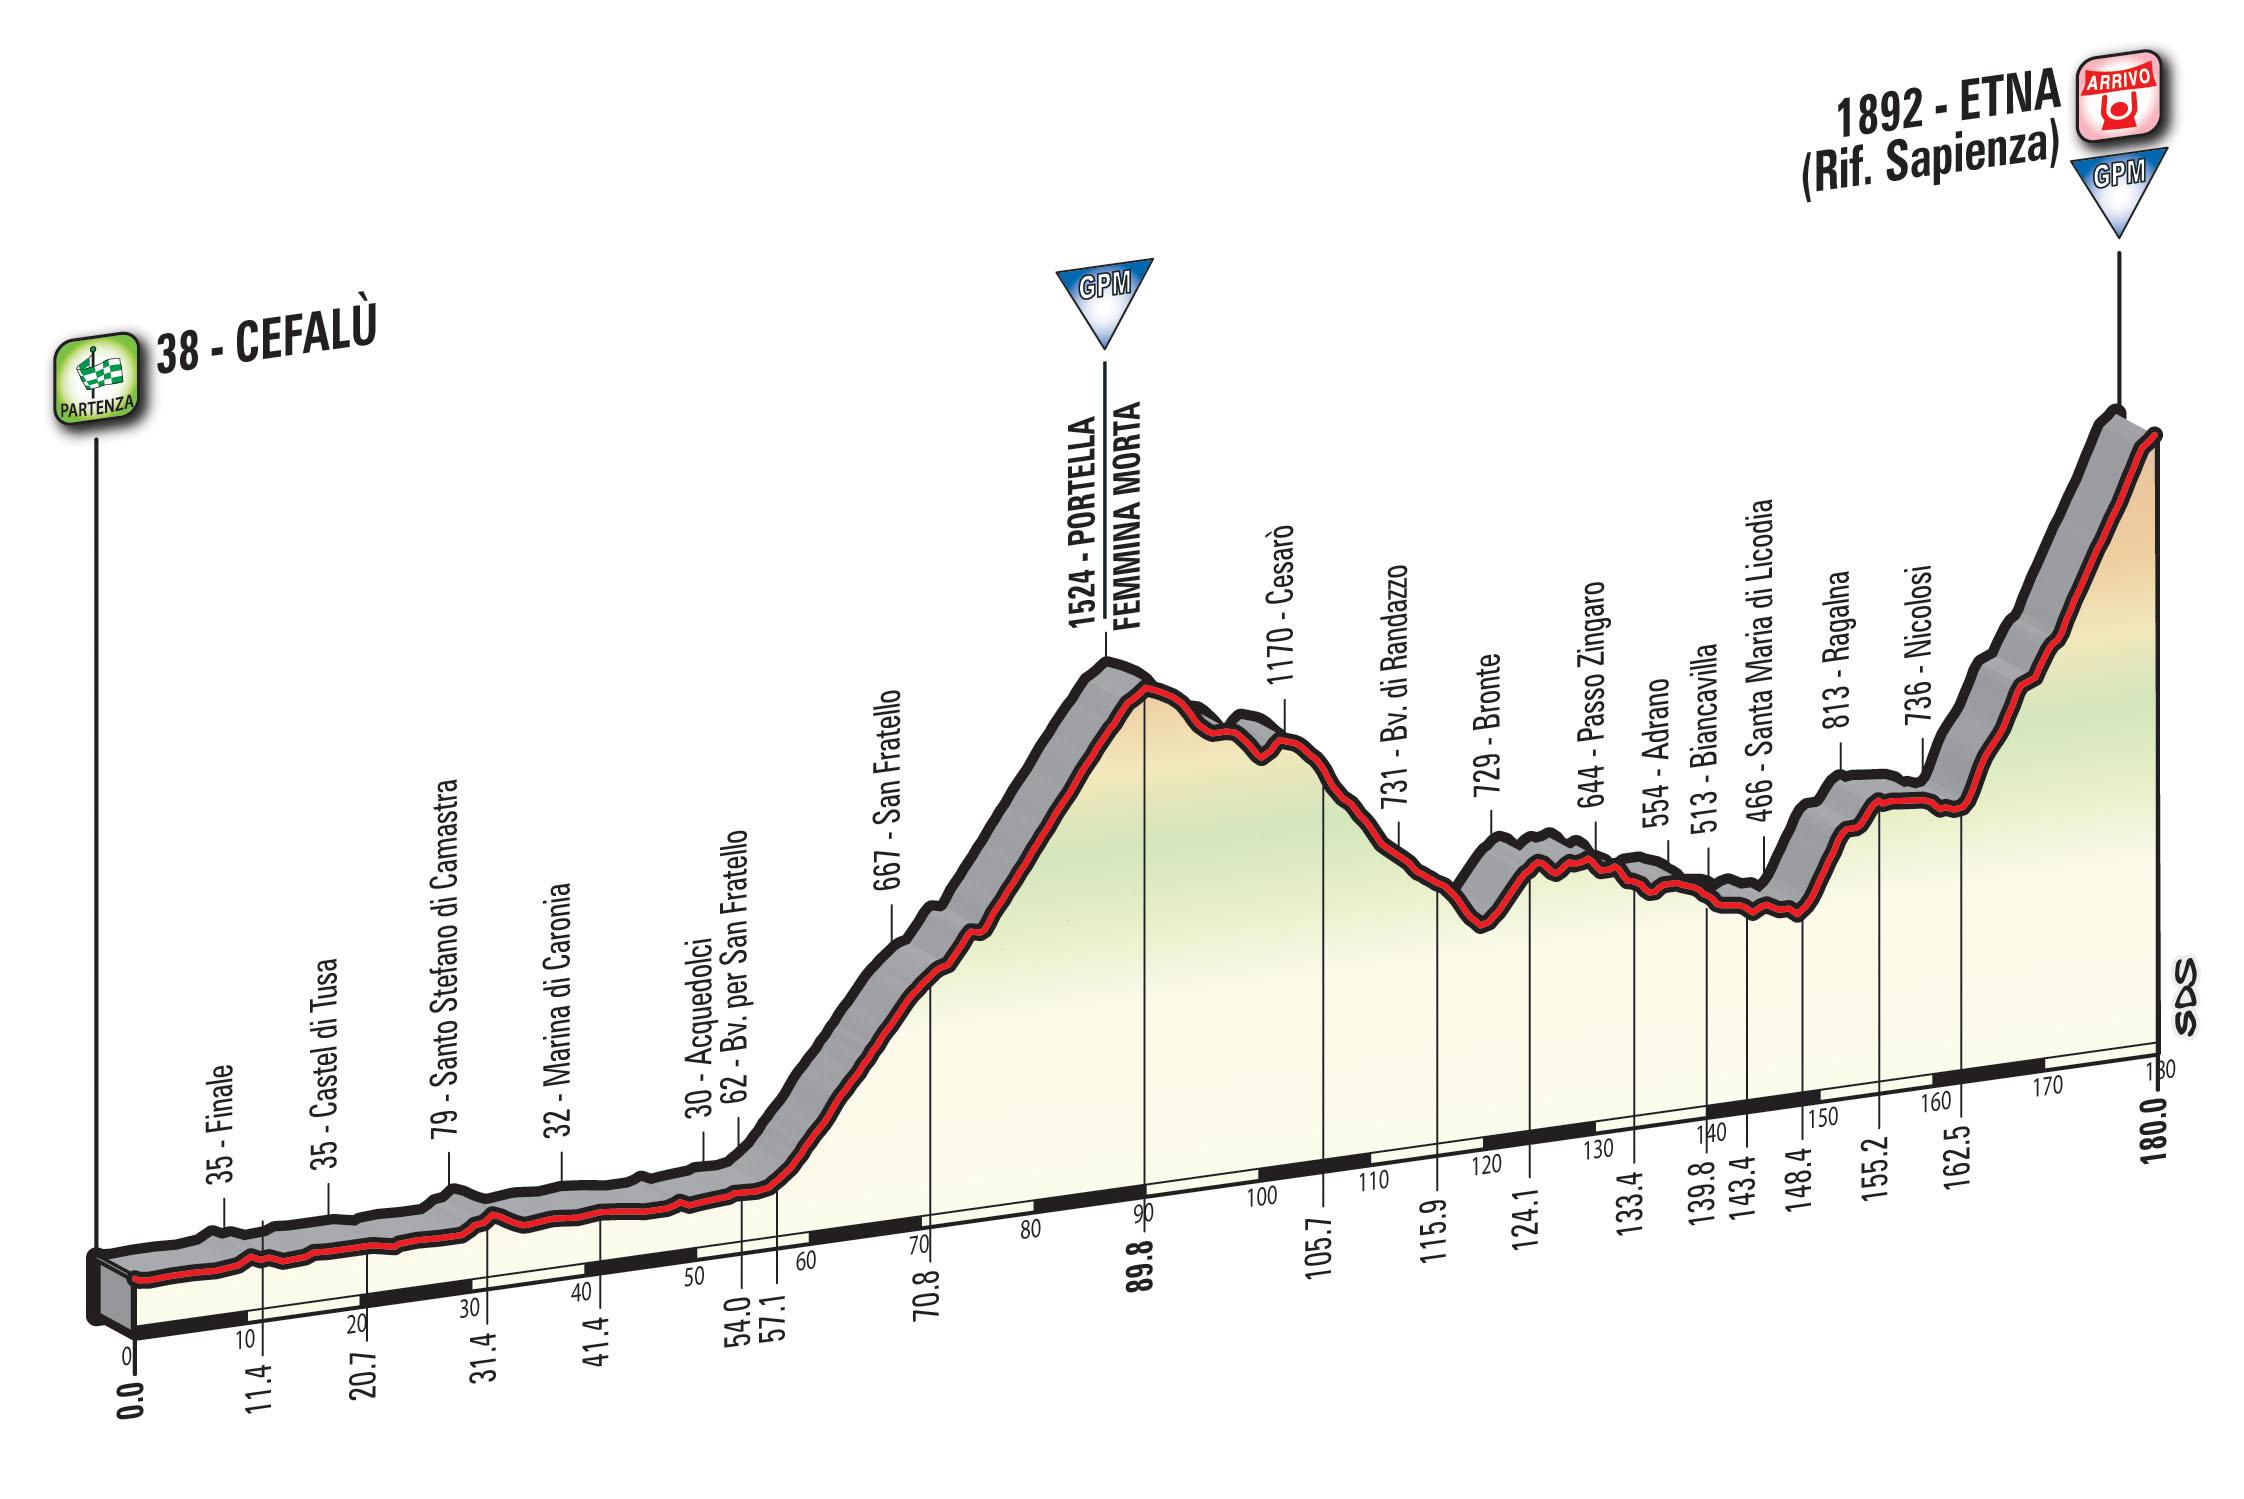 Giro d'Italia 2017 Etna Bronte